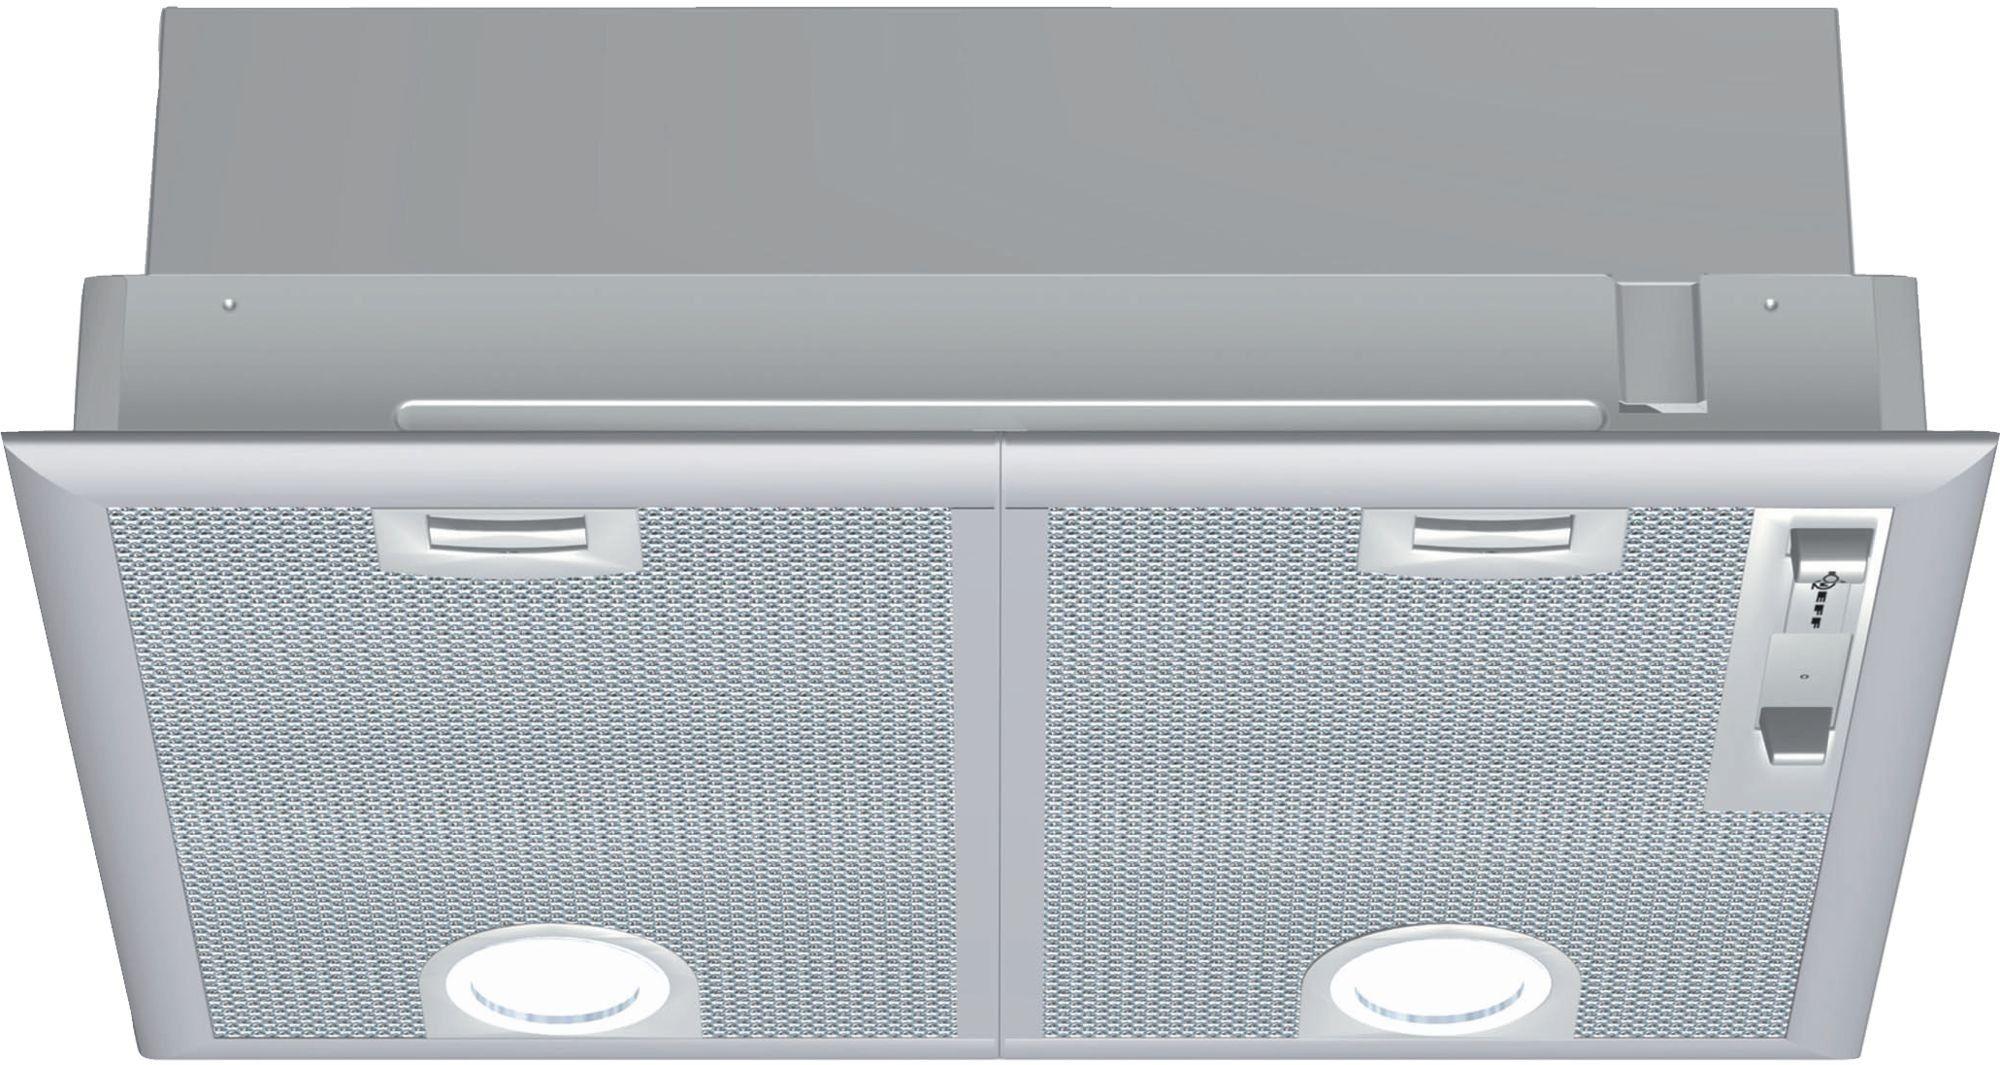 Neff D5655x1gb 53cm Canopy Hood Silver Stainless Range Hood